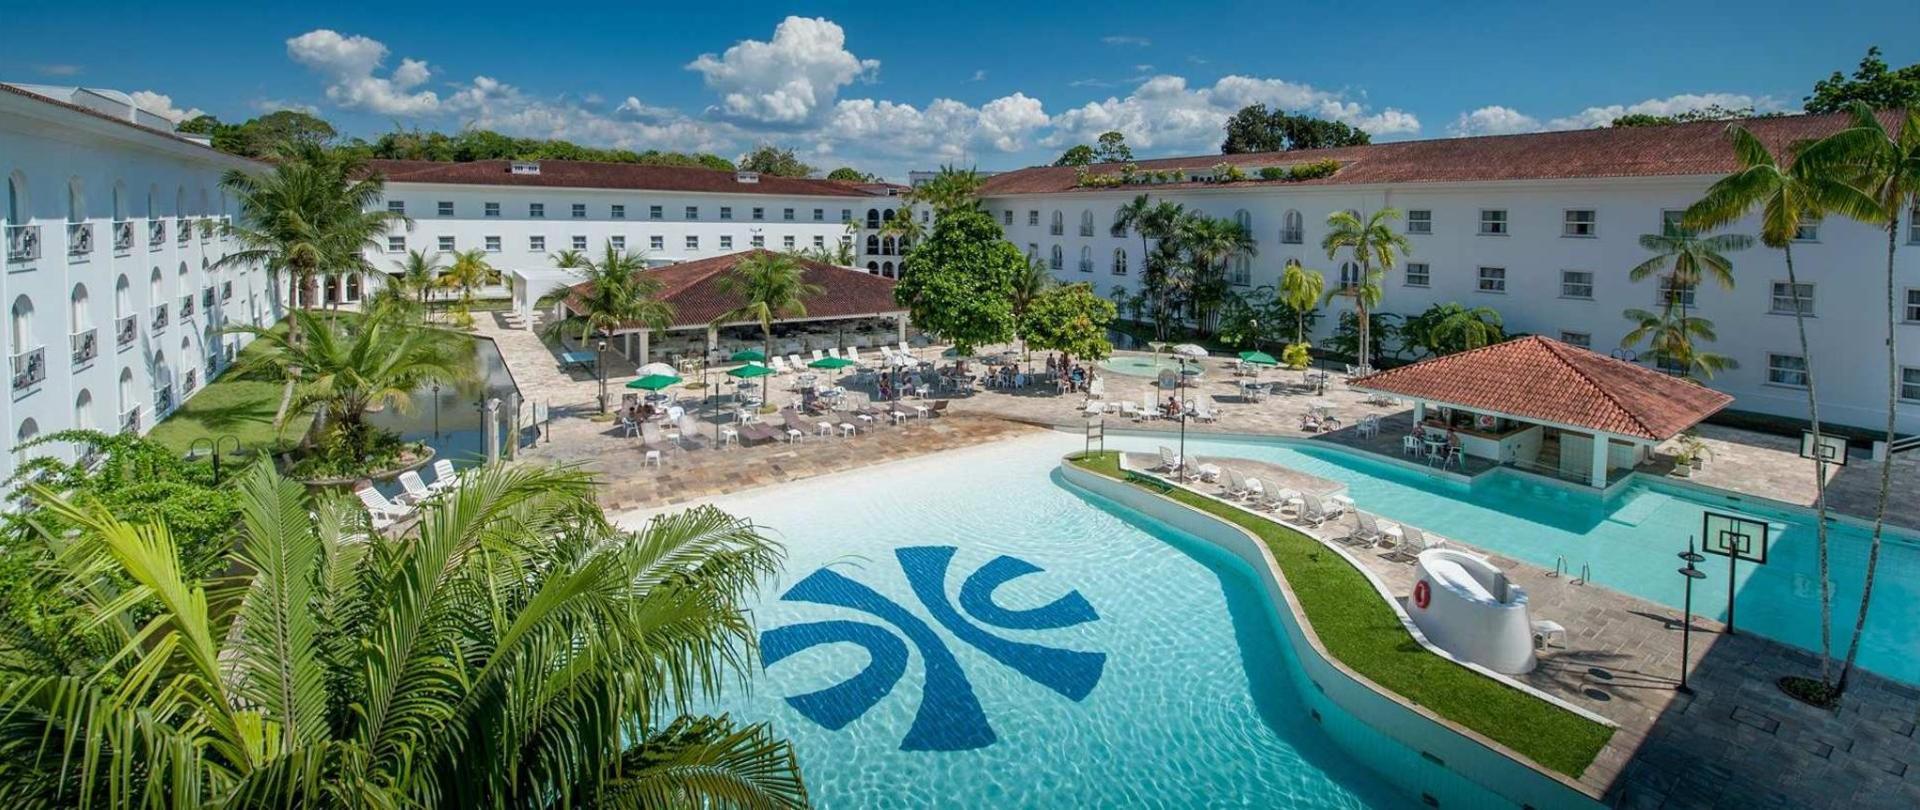 brazil-beach-house-hotel-for-sale-in-manaus.jpg